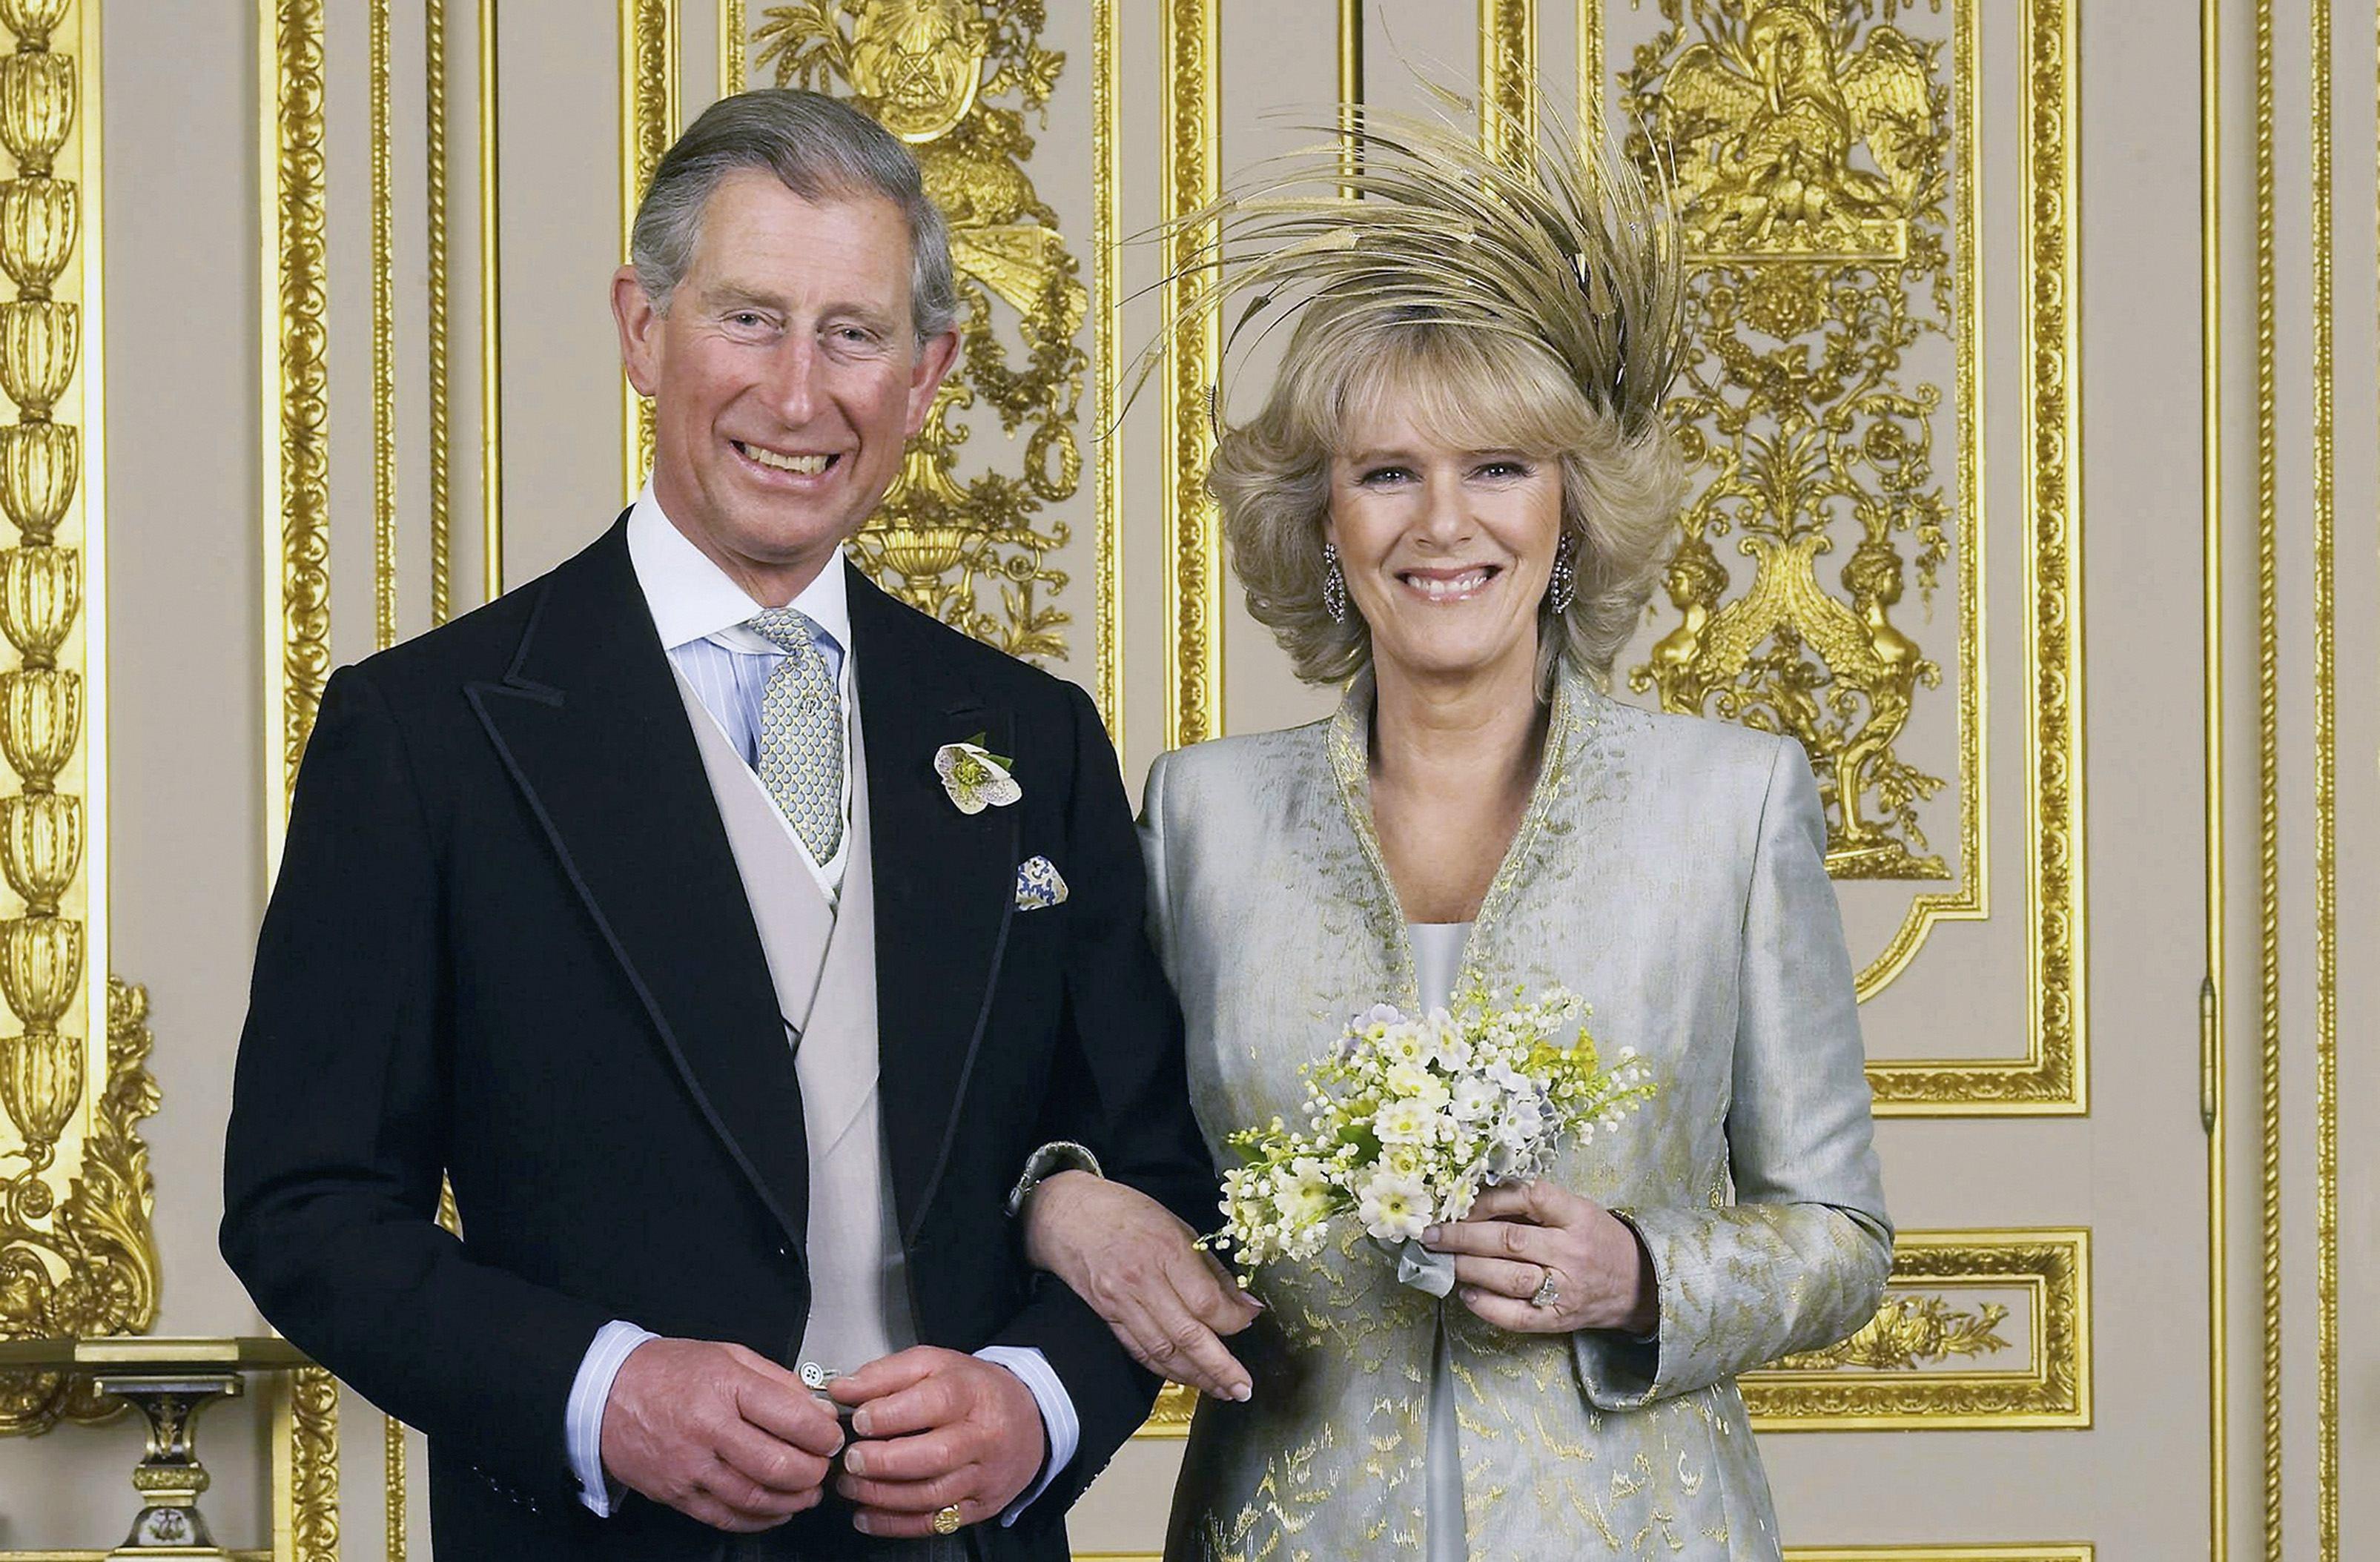 Prince Charles and Camilla Parker Bowles at their wedding